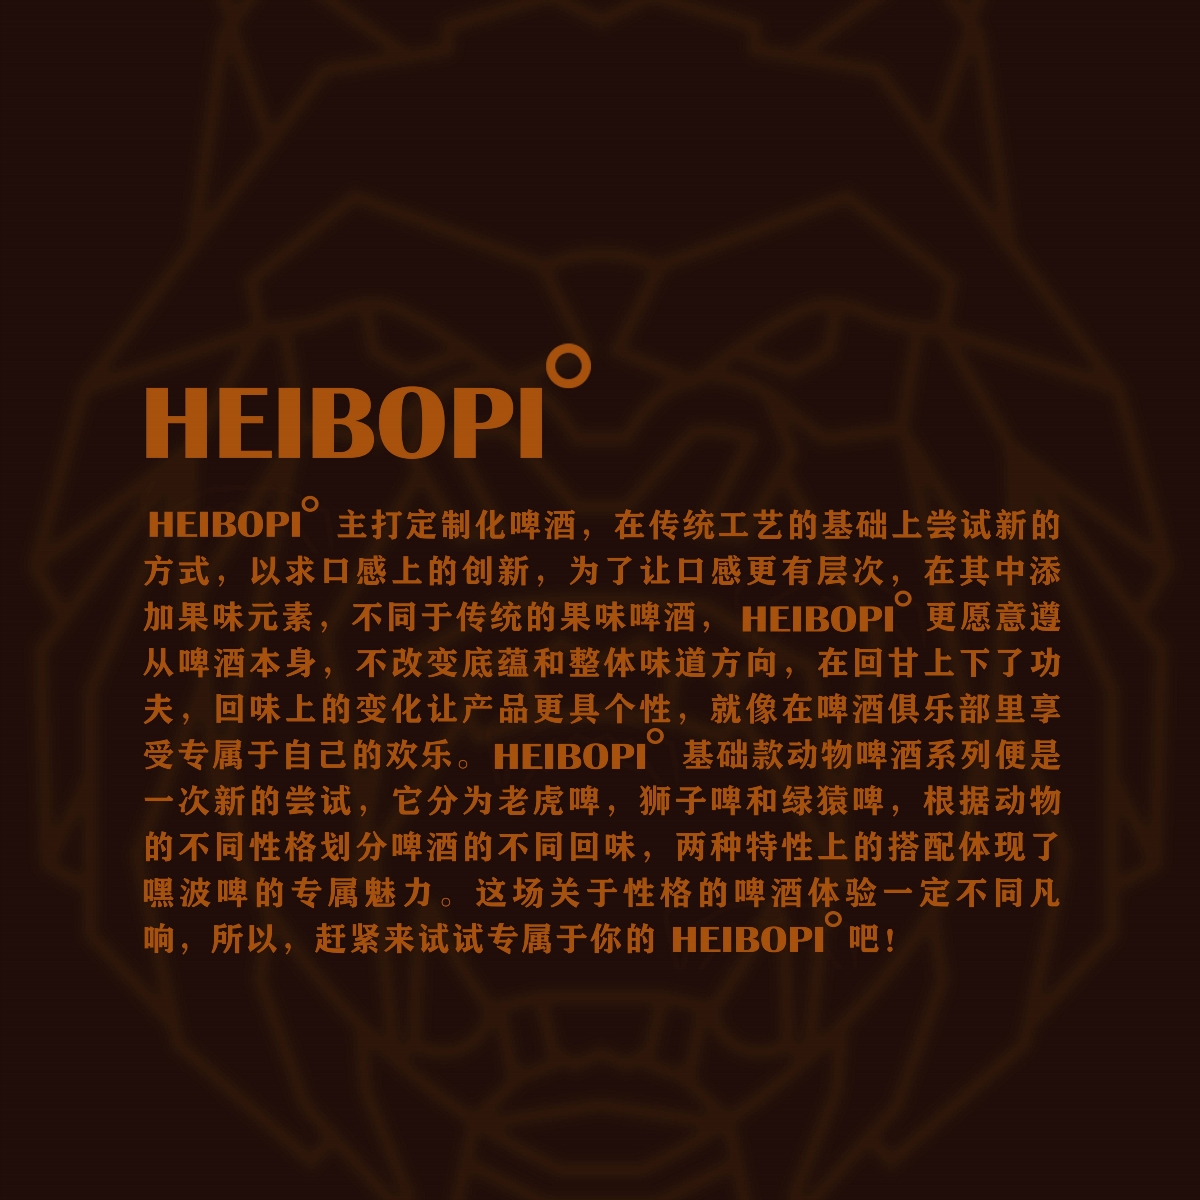 HEIBOPI°   定制化啤酒包装设计【原创】